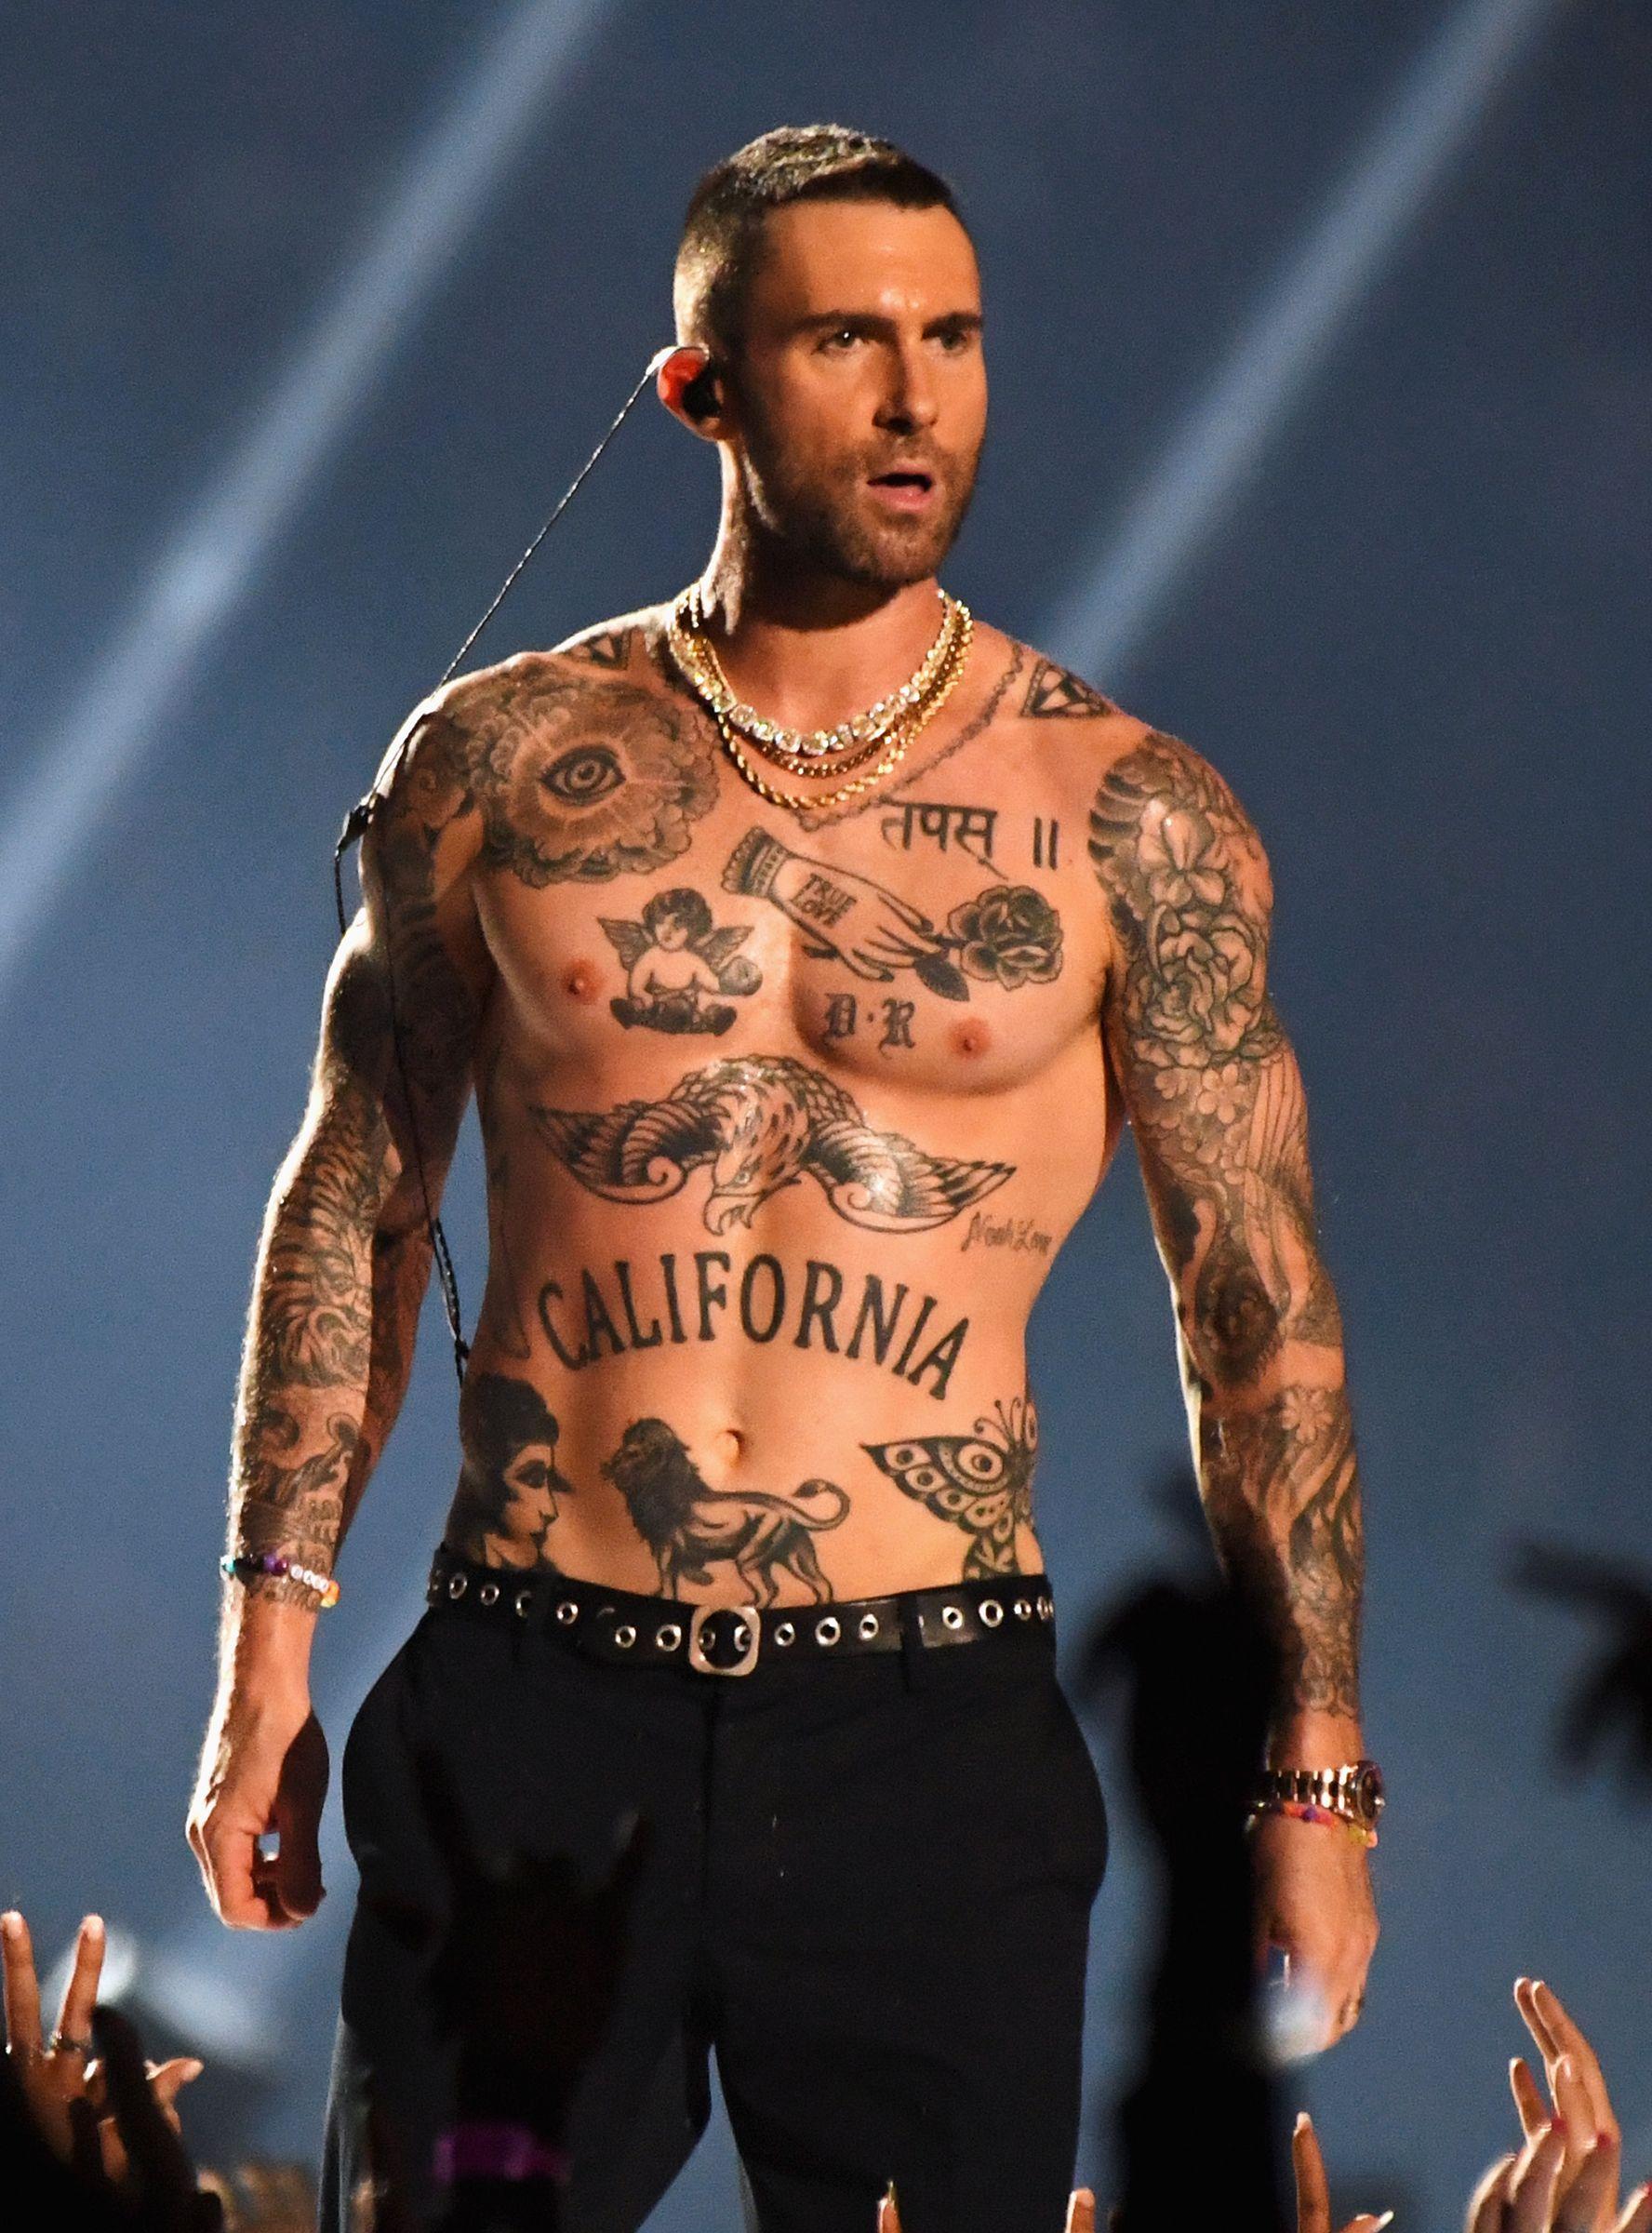 adam levine tattoos - HD1741×2000